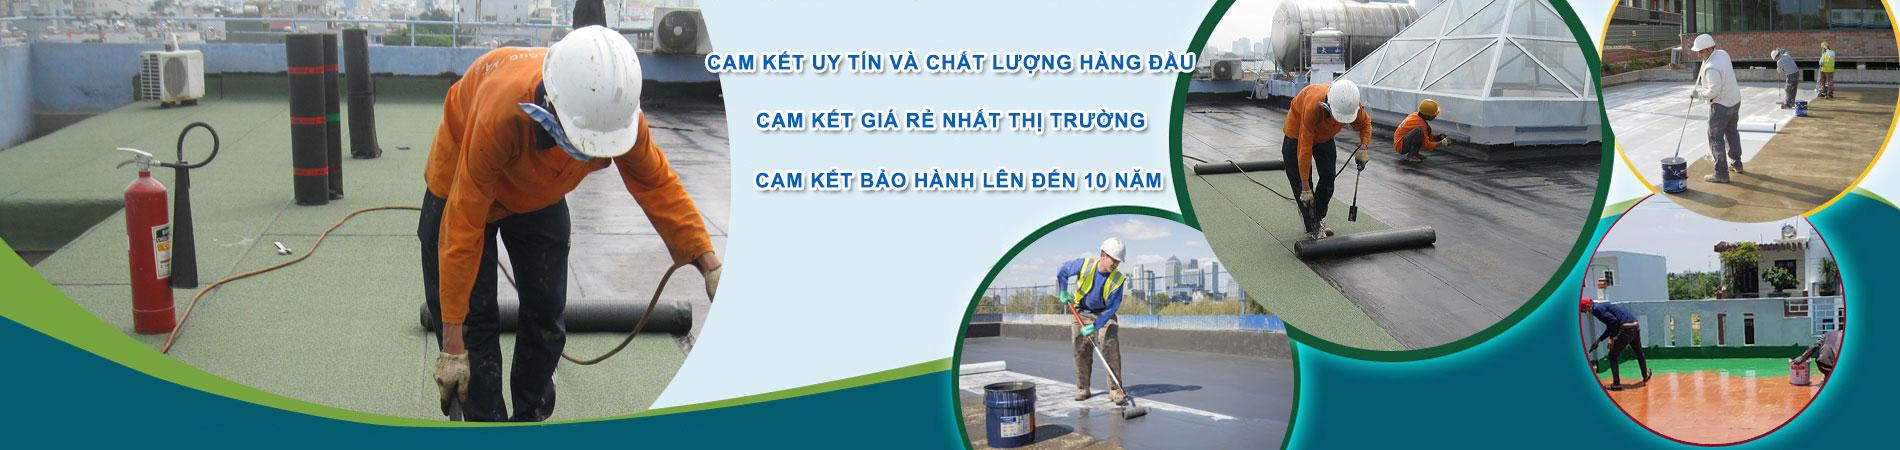 Slide Chongtham4